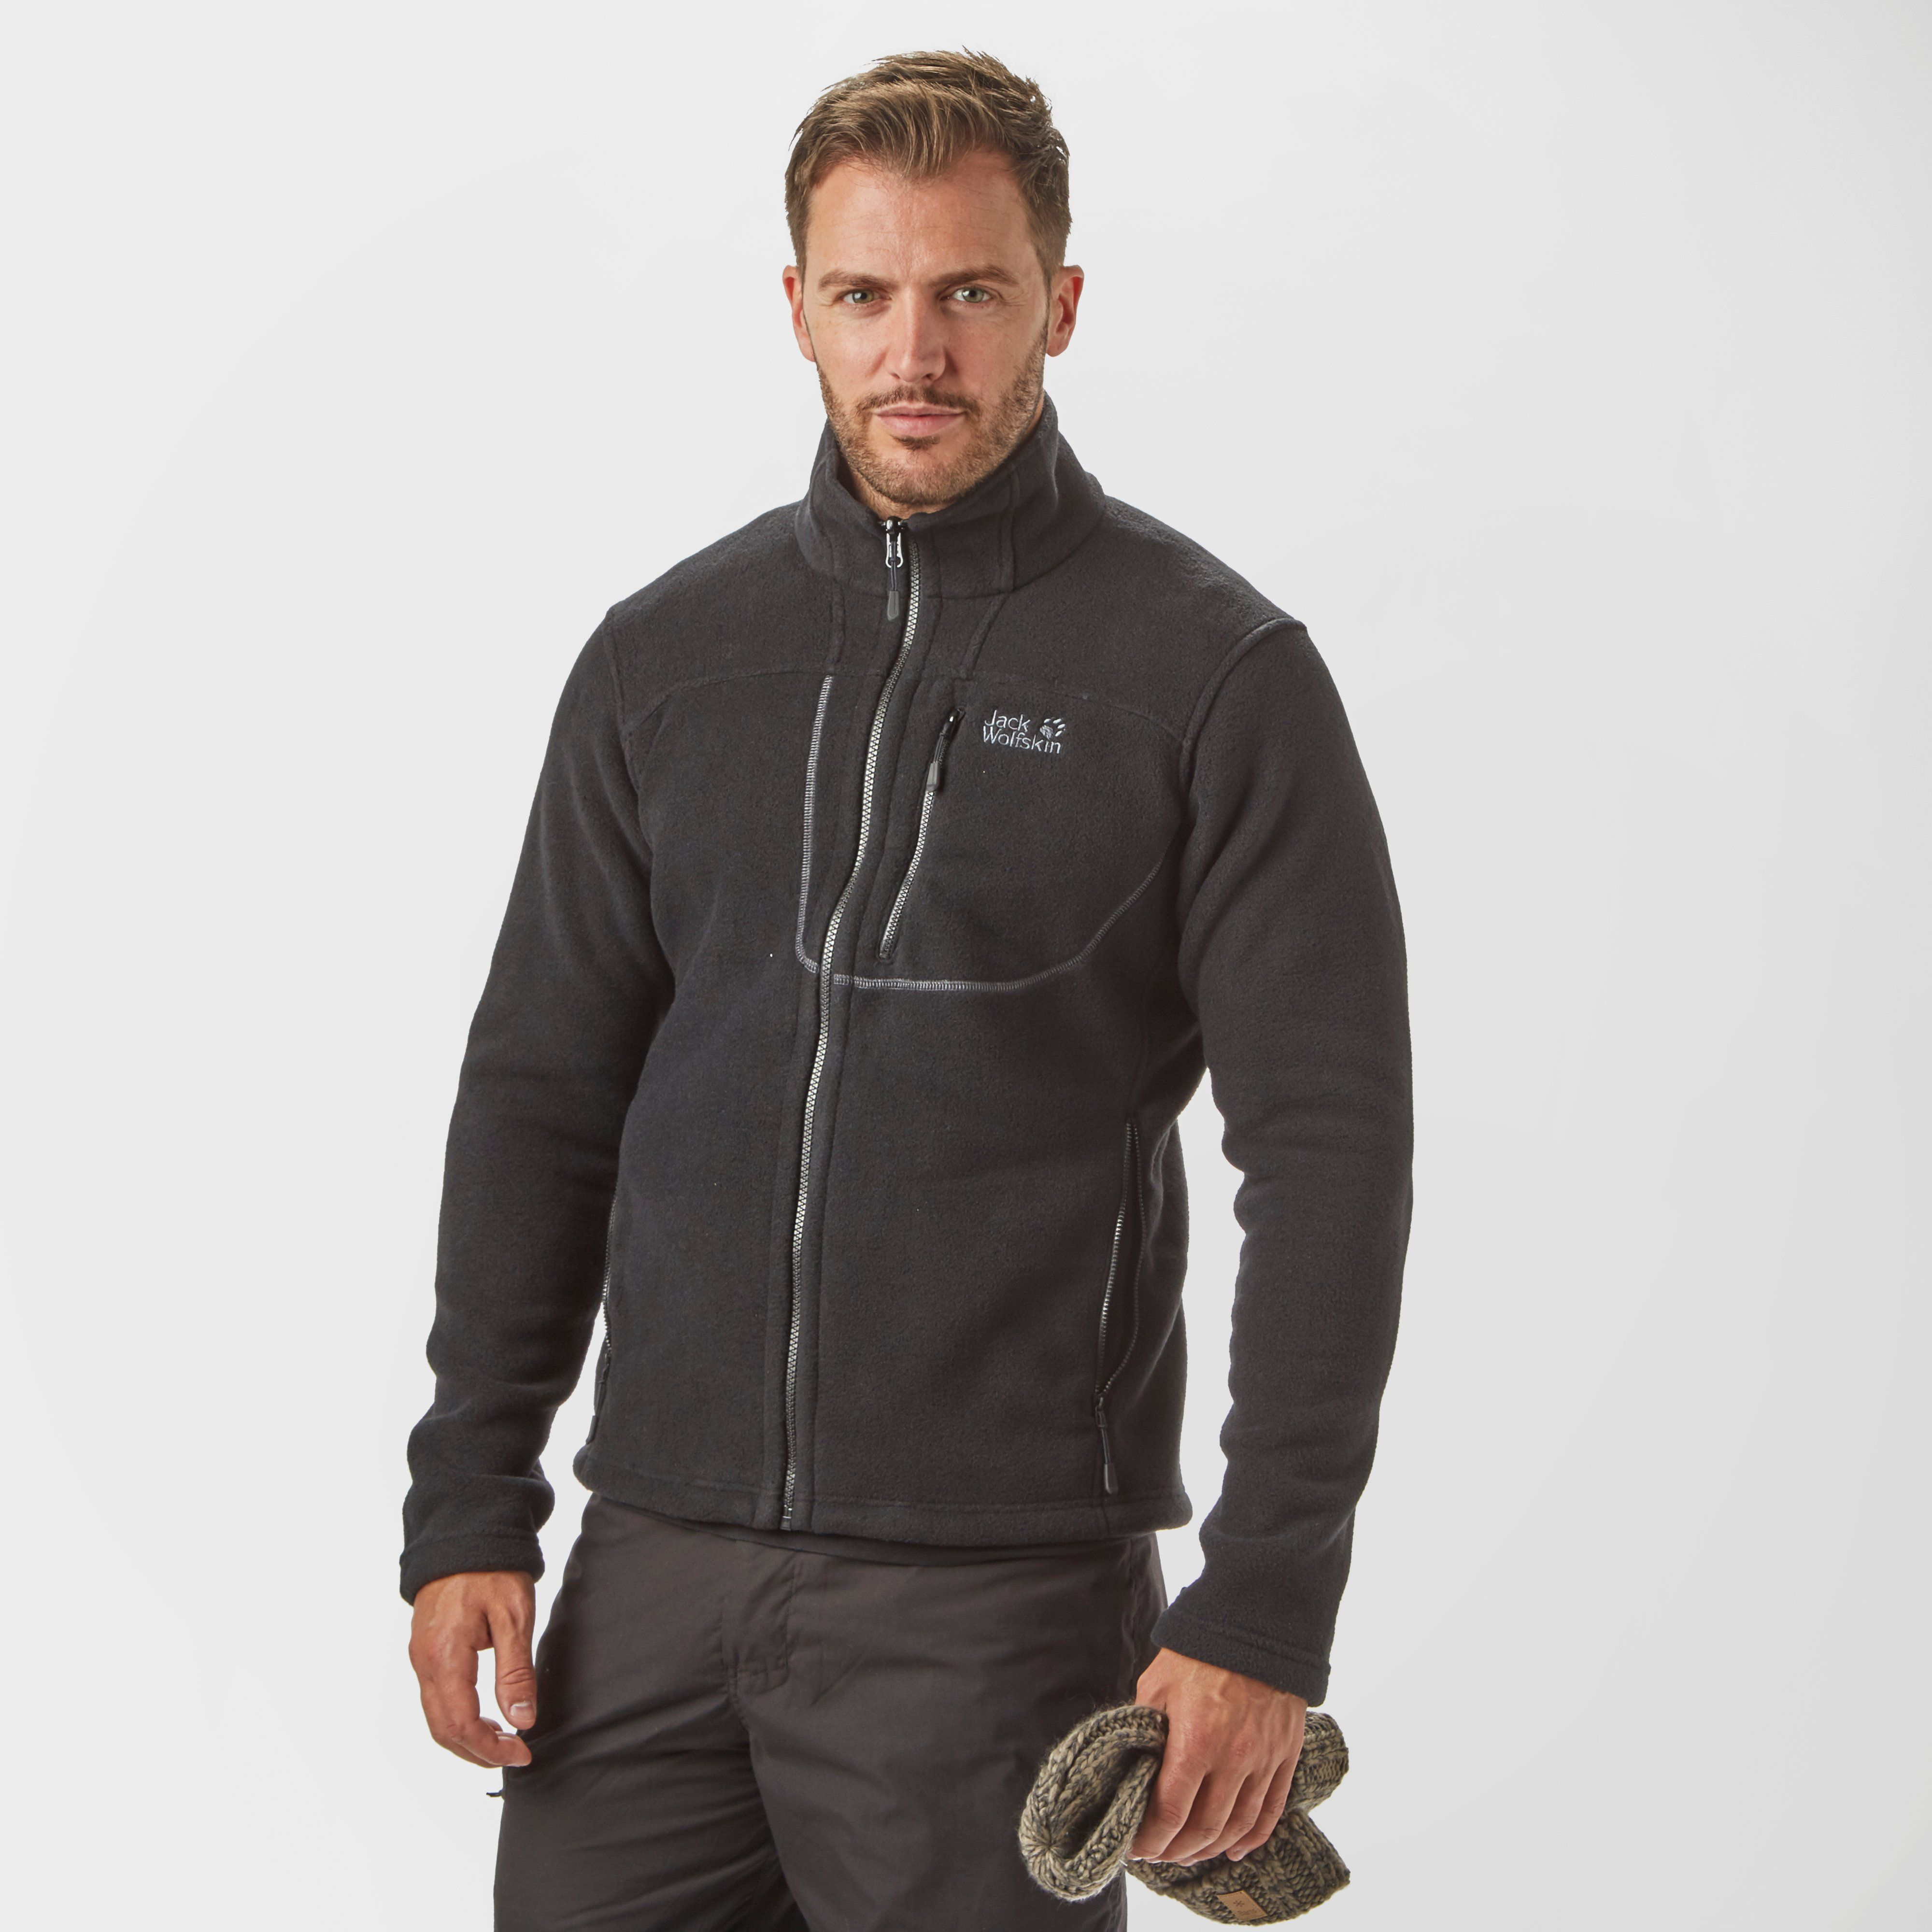 JACK WOLFSKIN Men's Vertigo Full-Zip Fleece